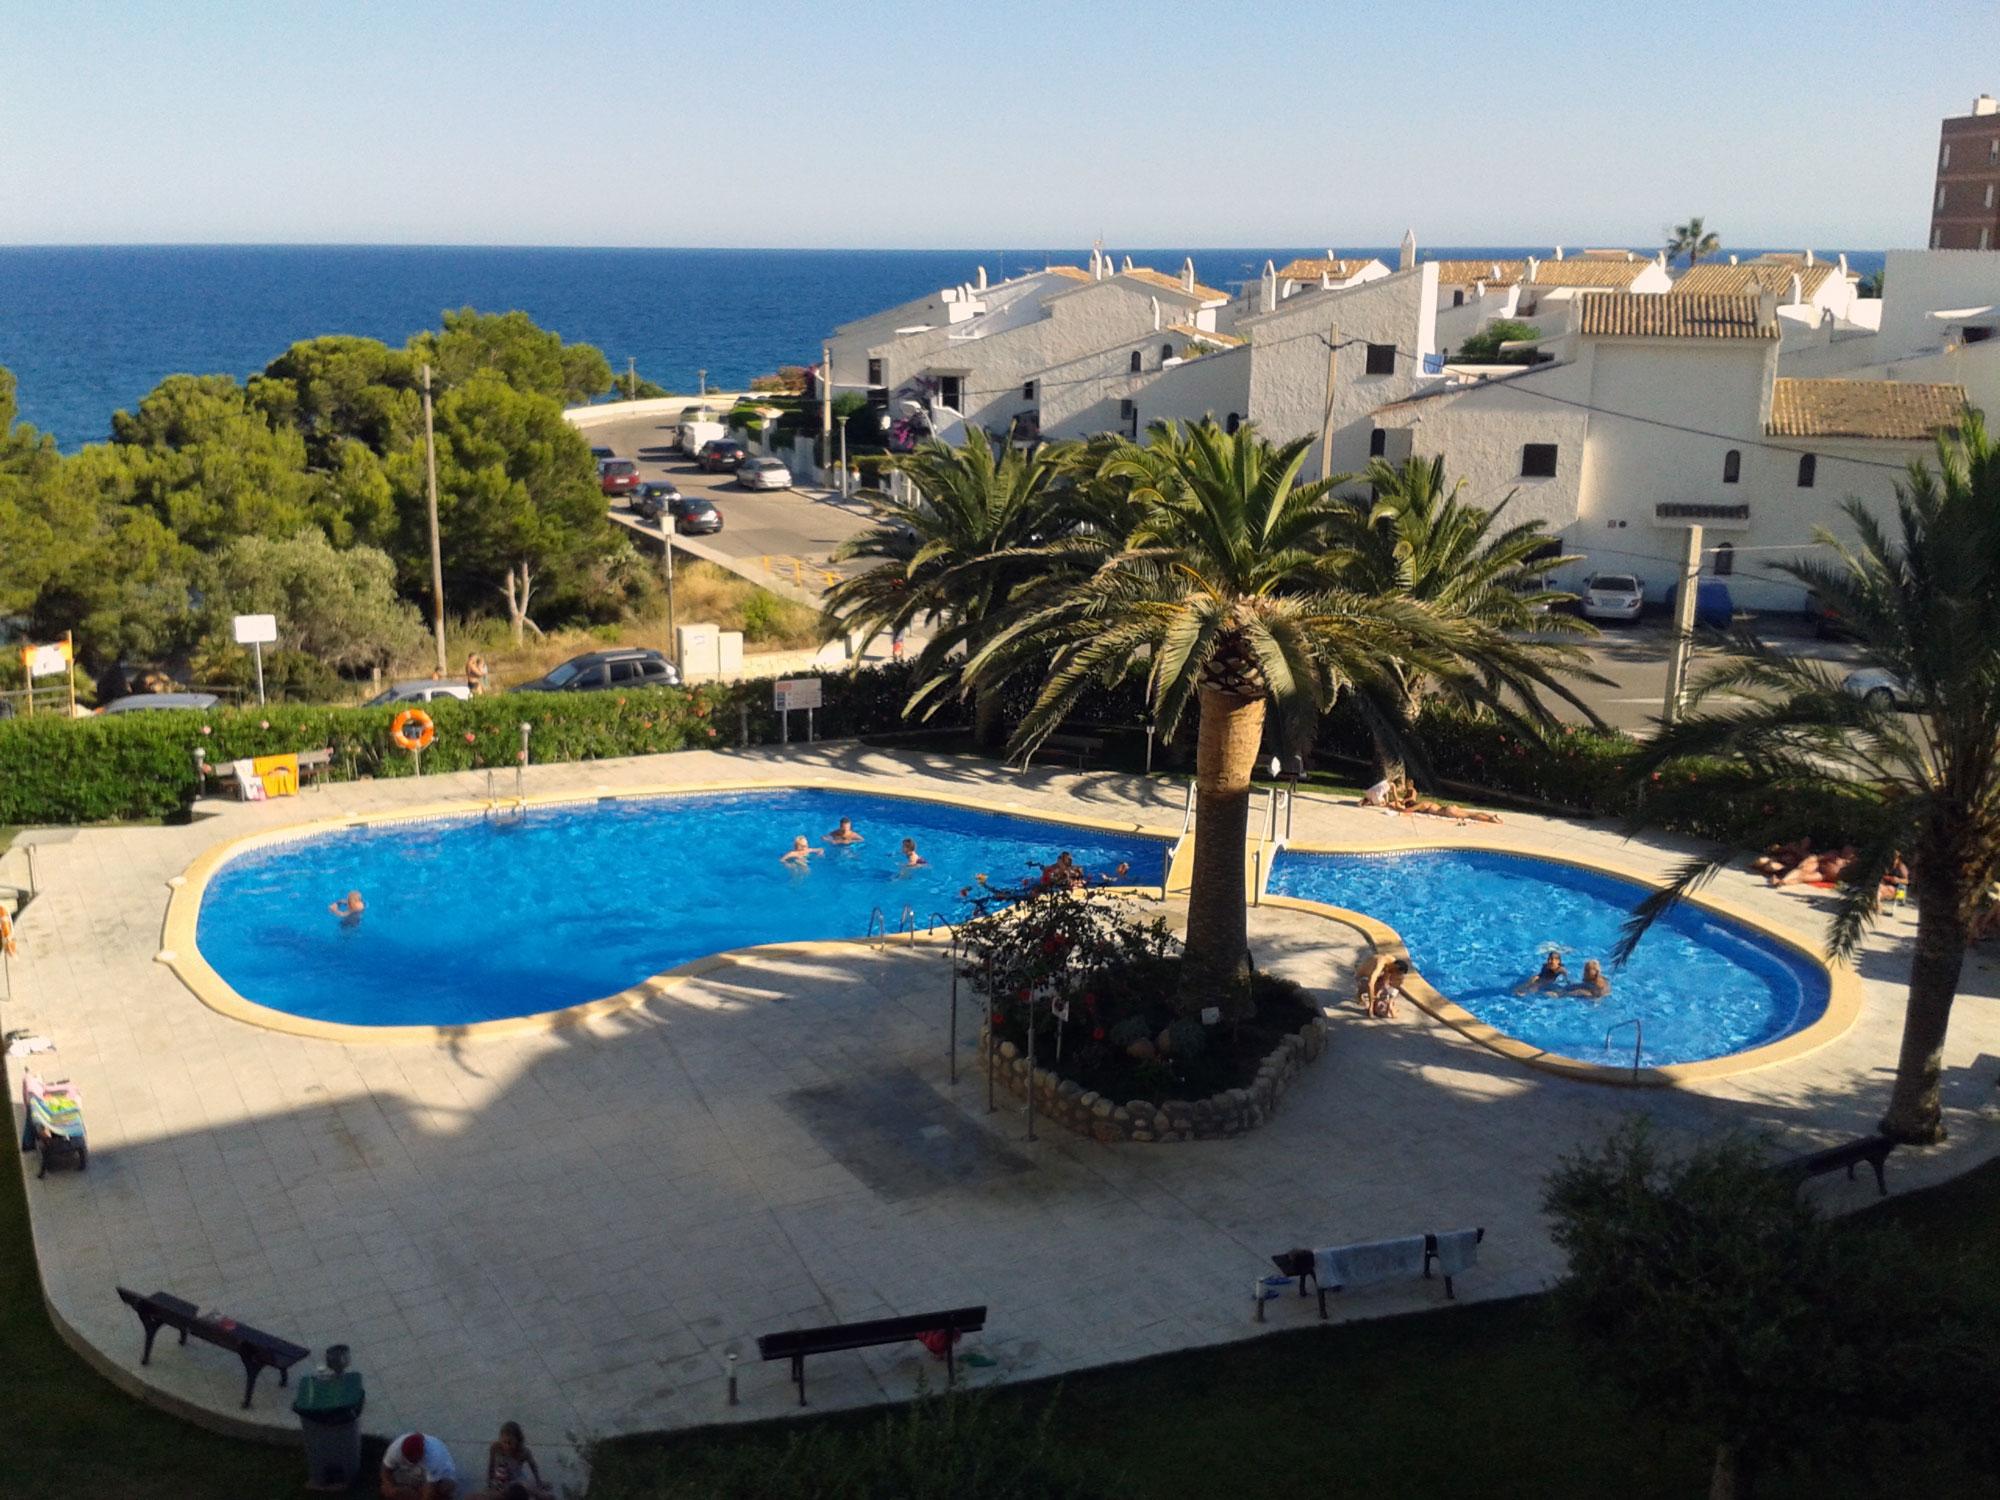 Construcci n de piscinas codetrac s l expertos en piscinas for Construccion piscinas